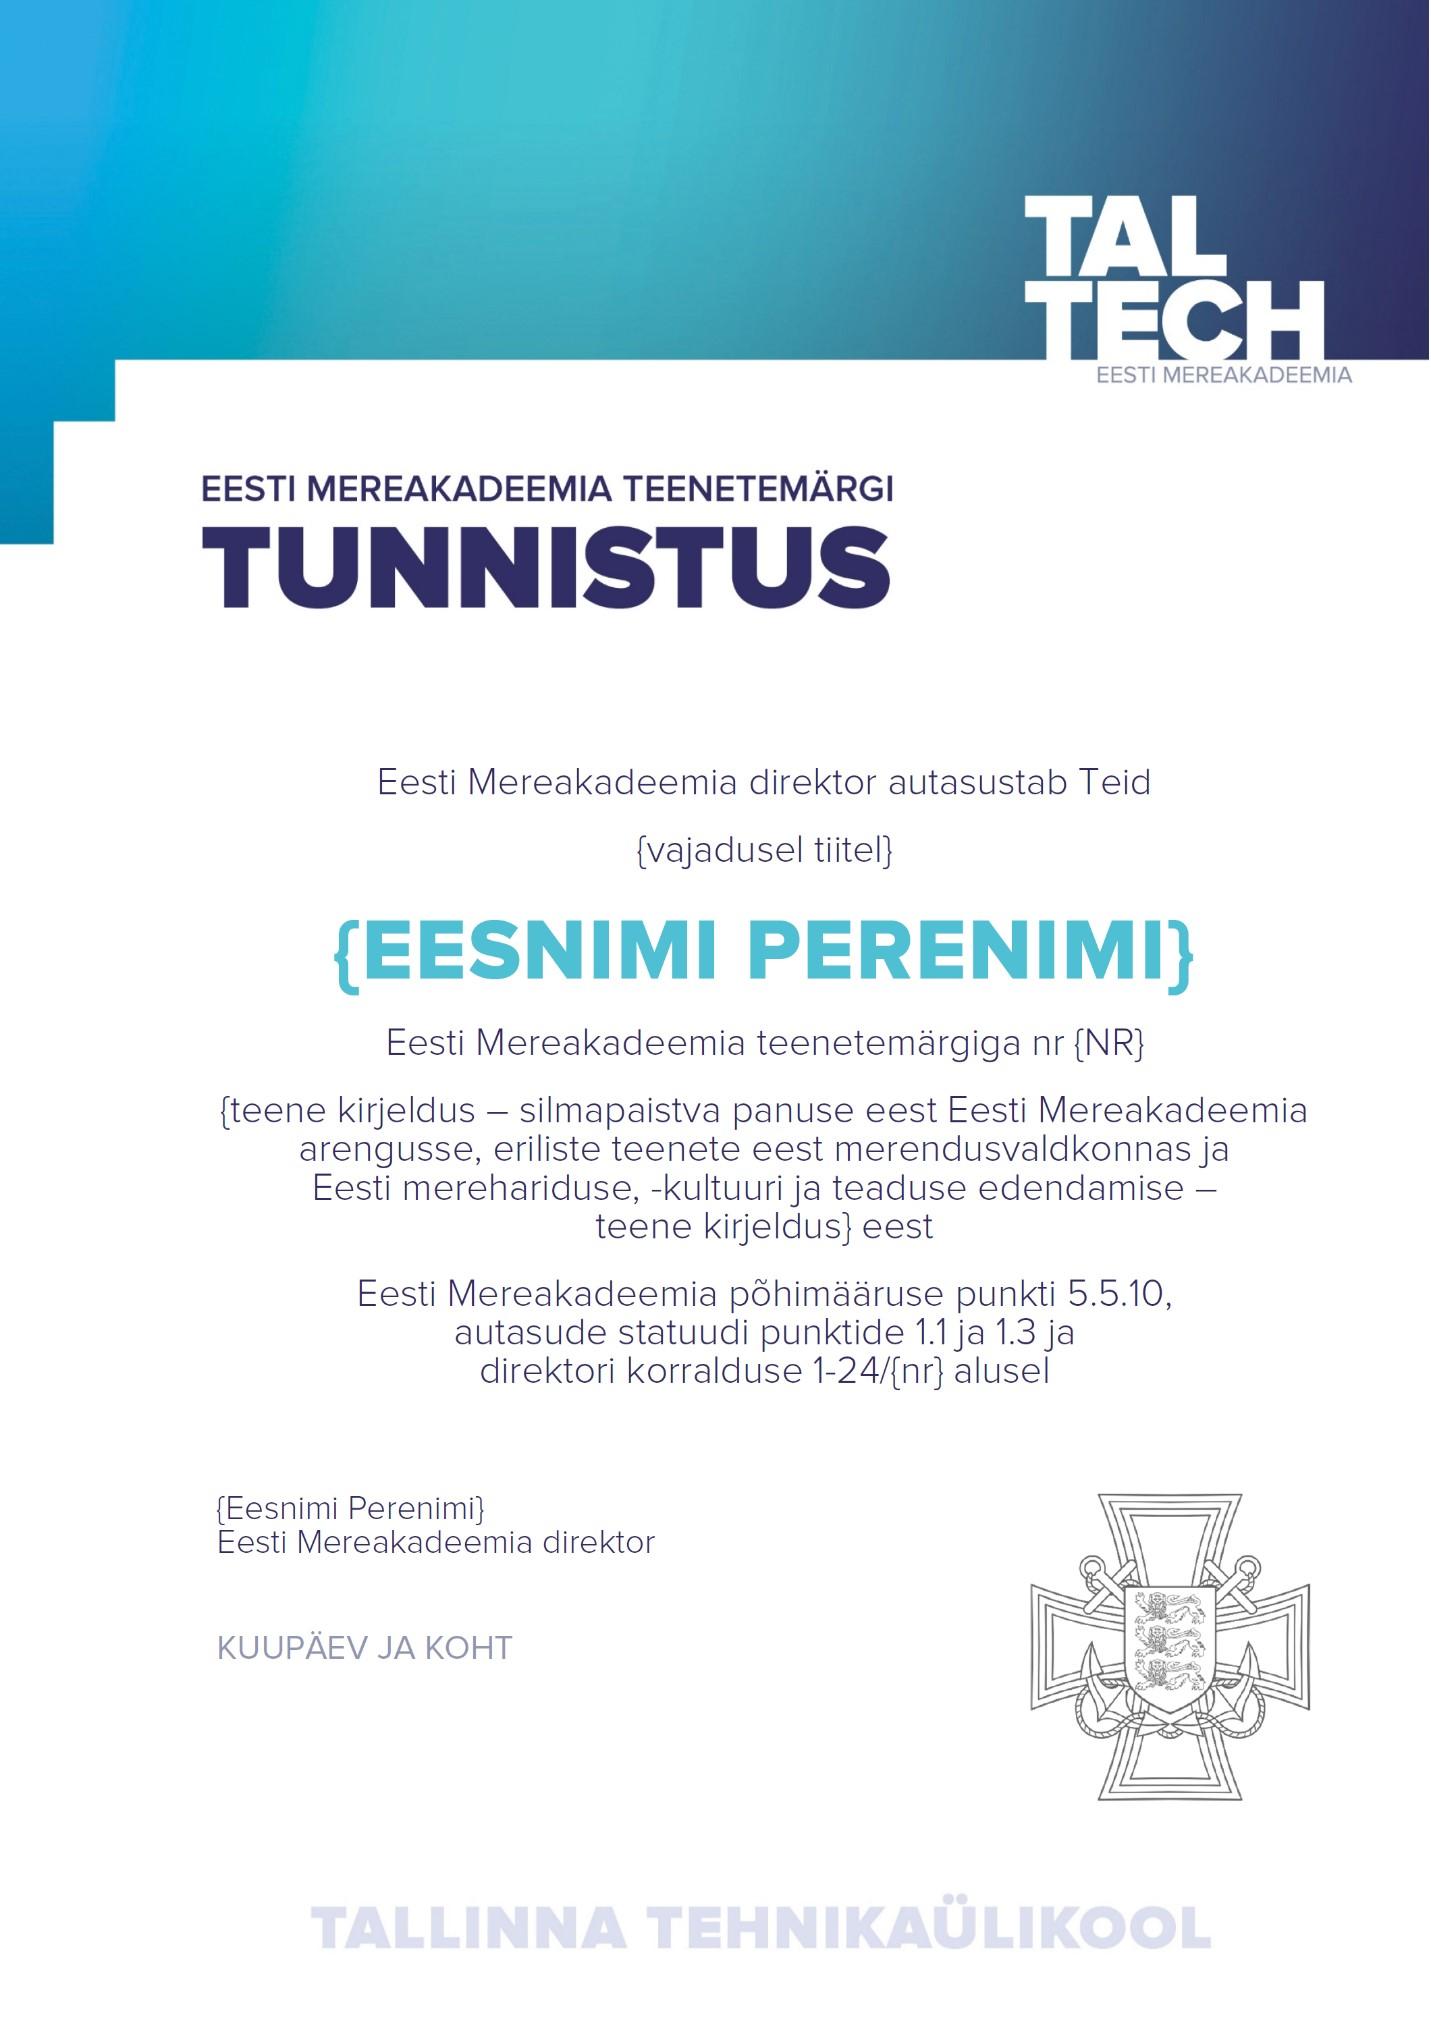 Eesti Mereakadeemia teenetemärgi tunnistus